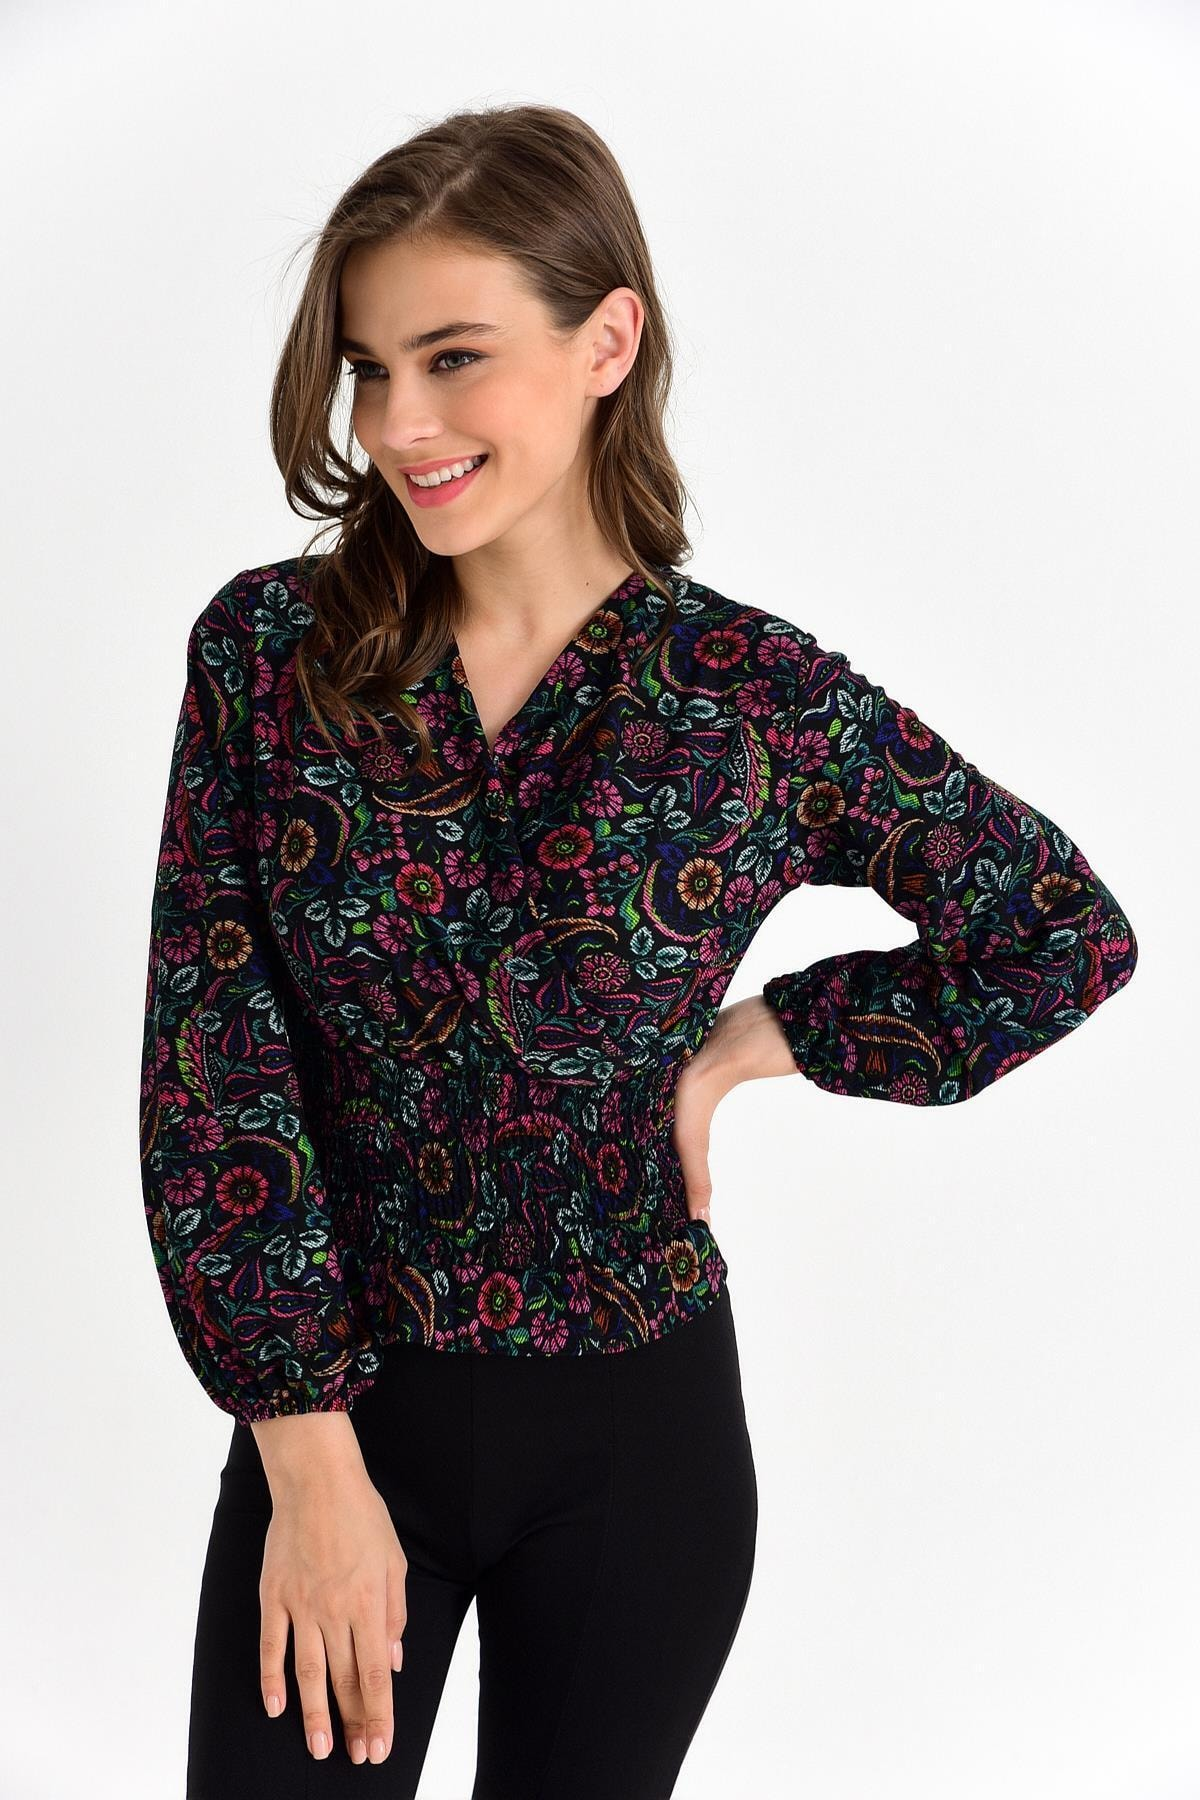 TENA MODA Kadın Siyah-fuşya Örme Crep Gipeli Bluz 1